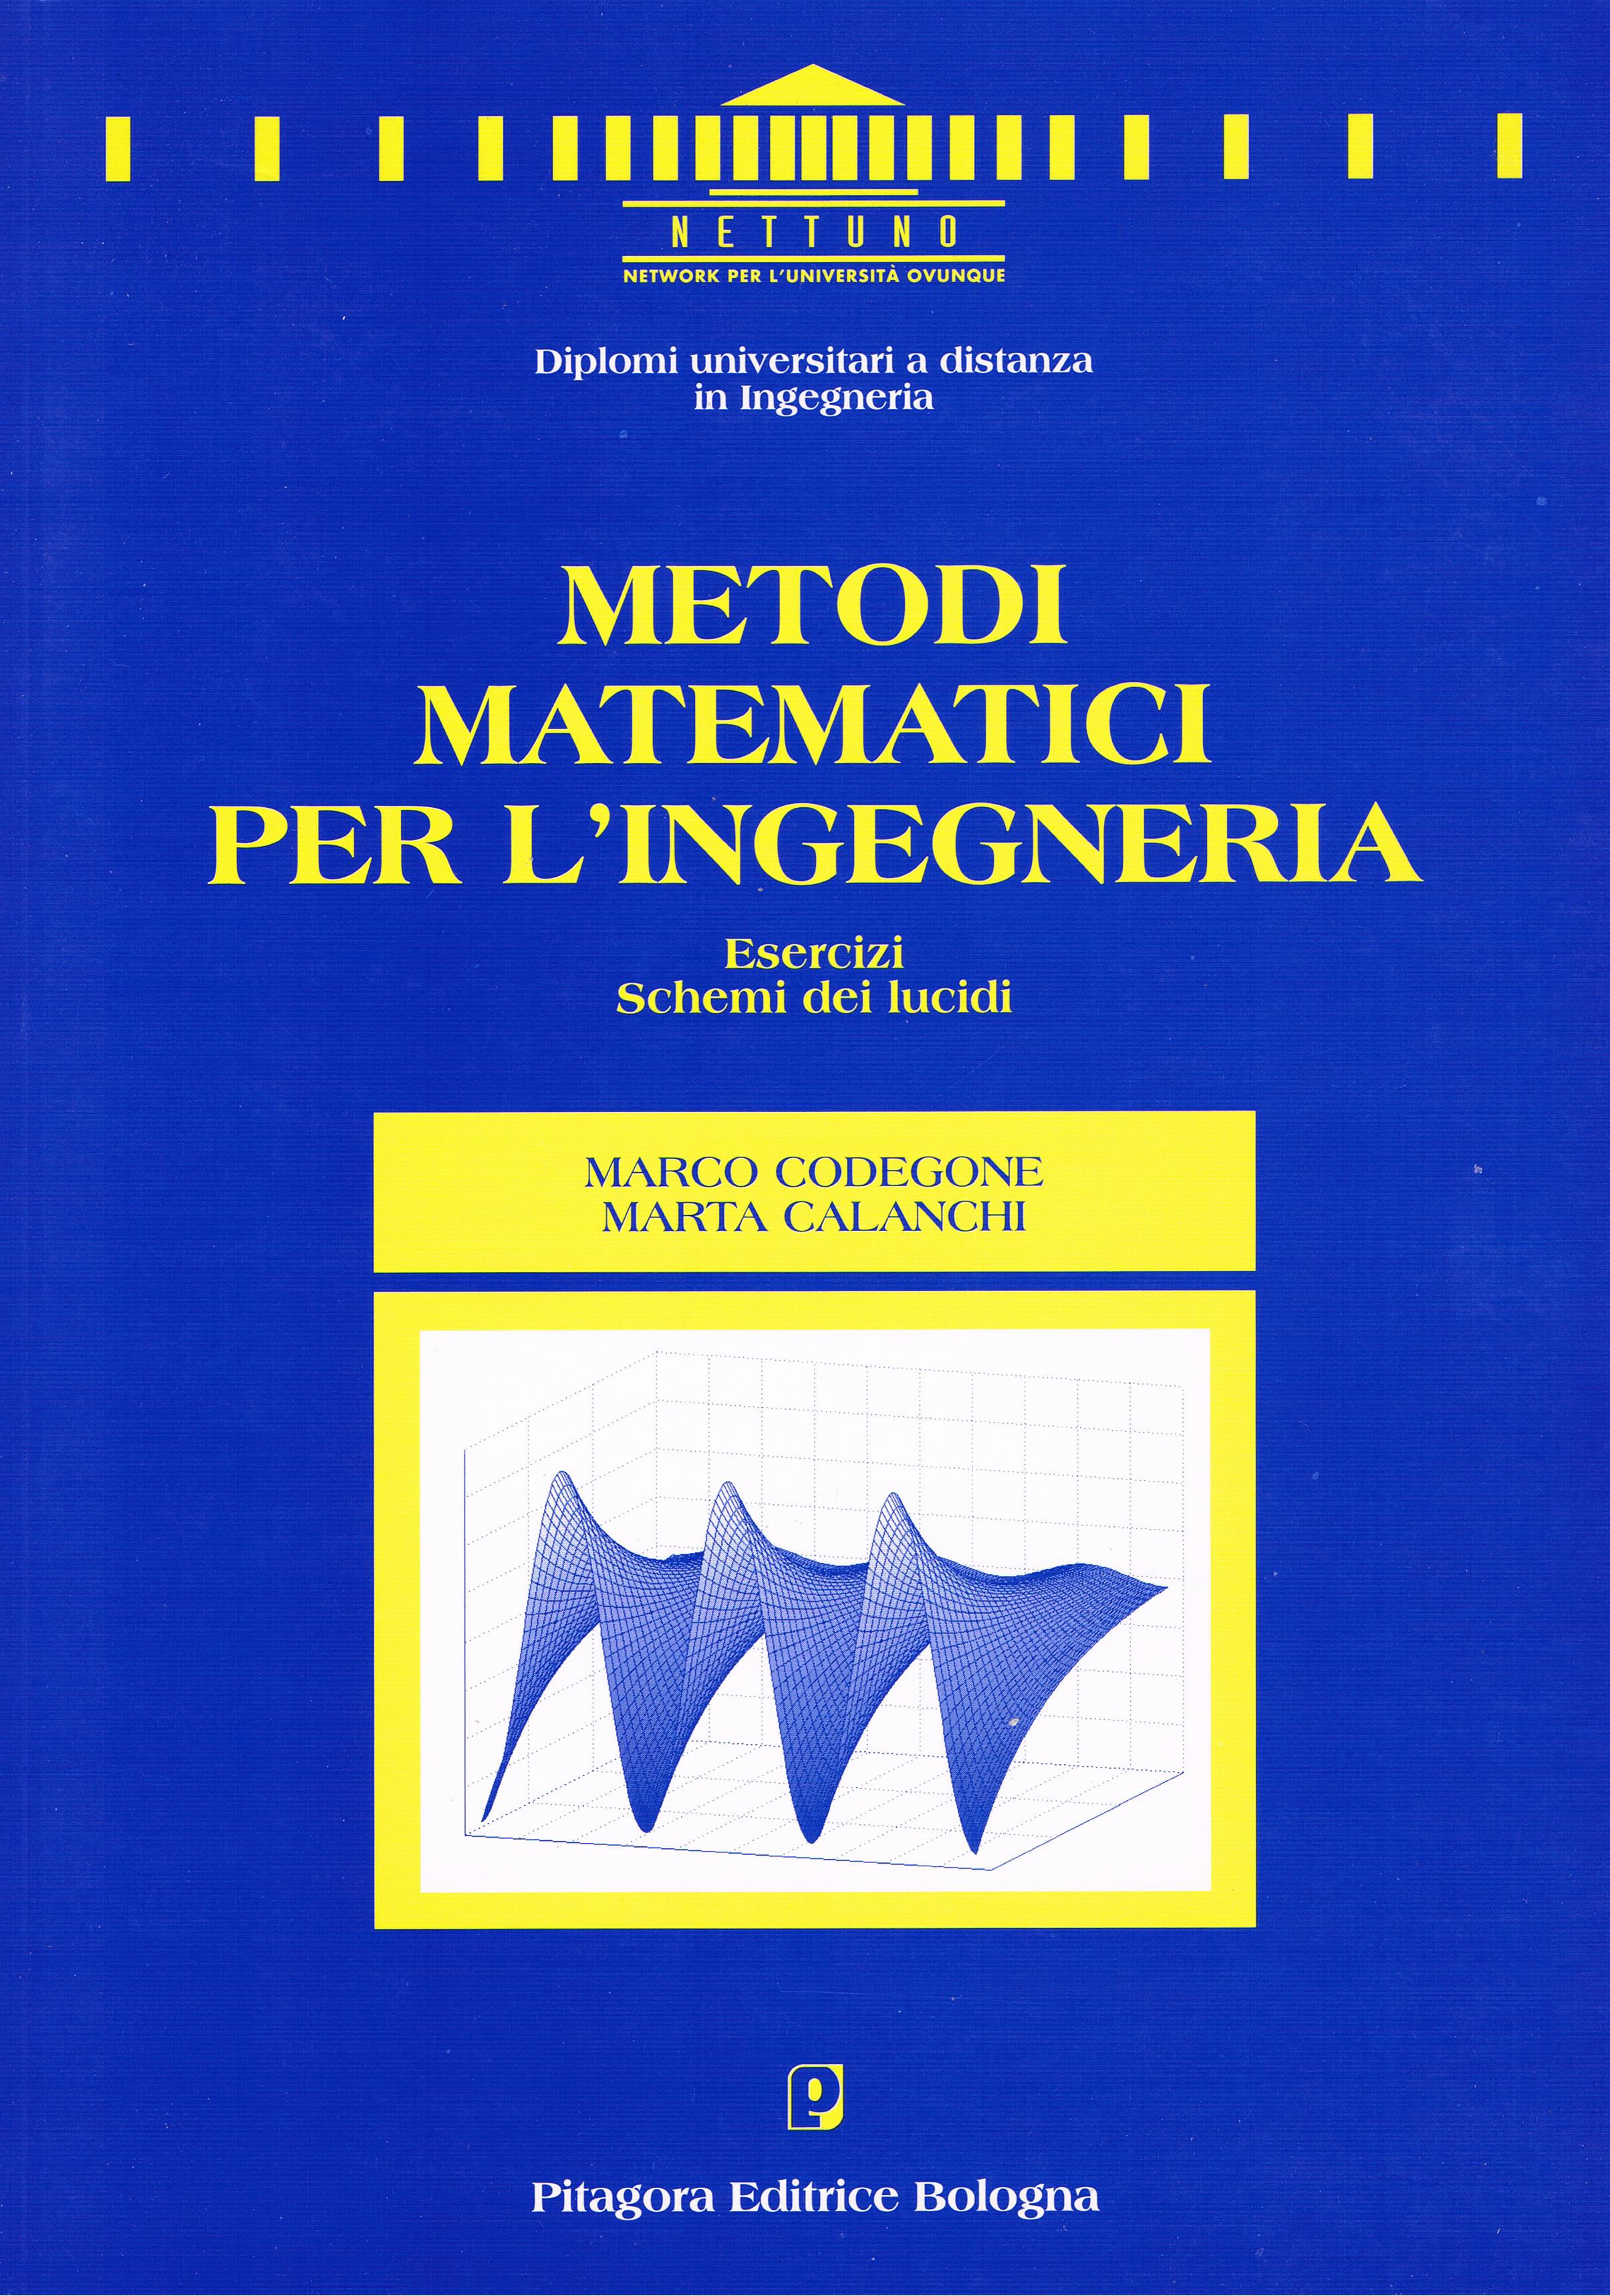 Metodi matematici per l'ingegneria